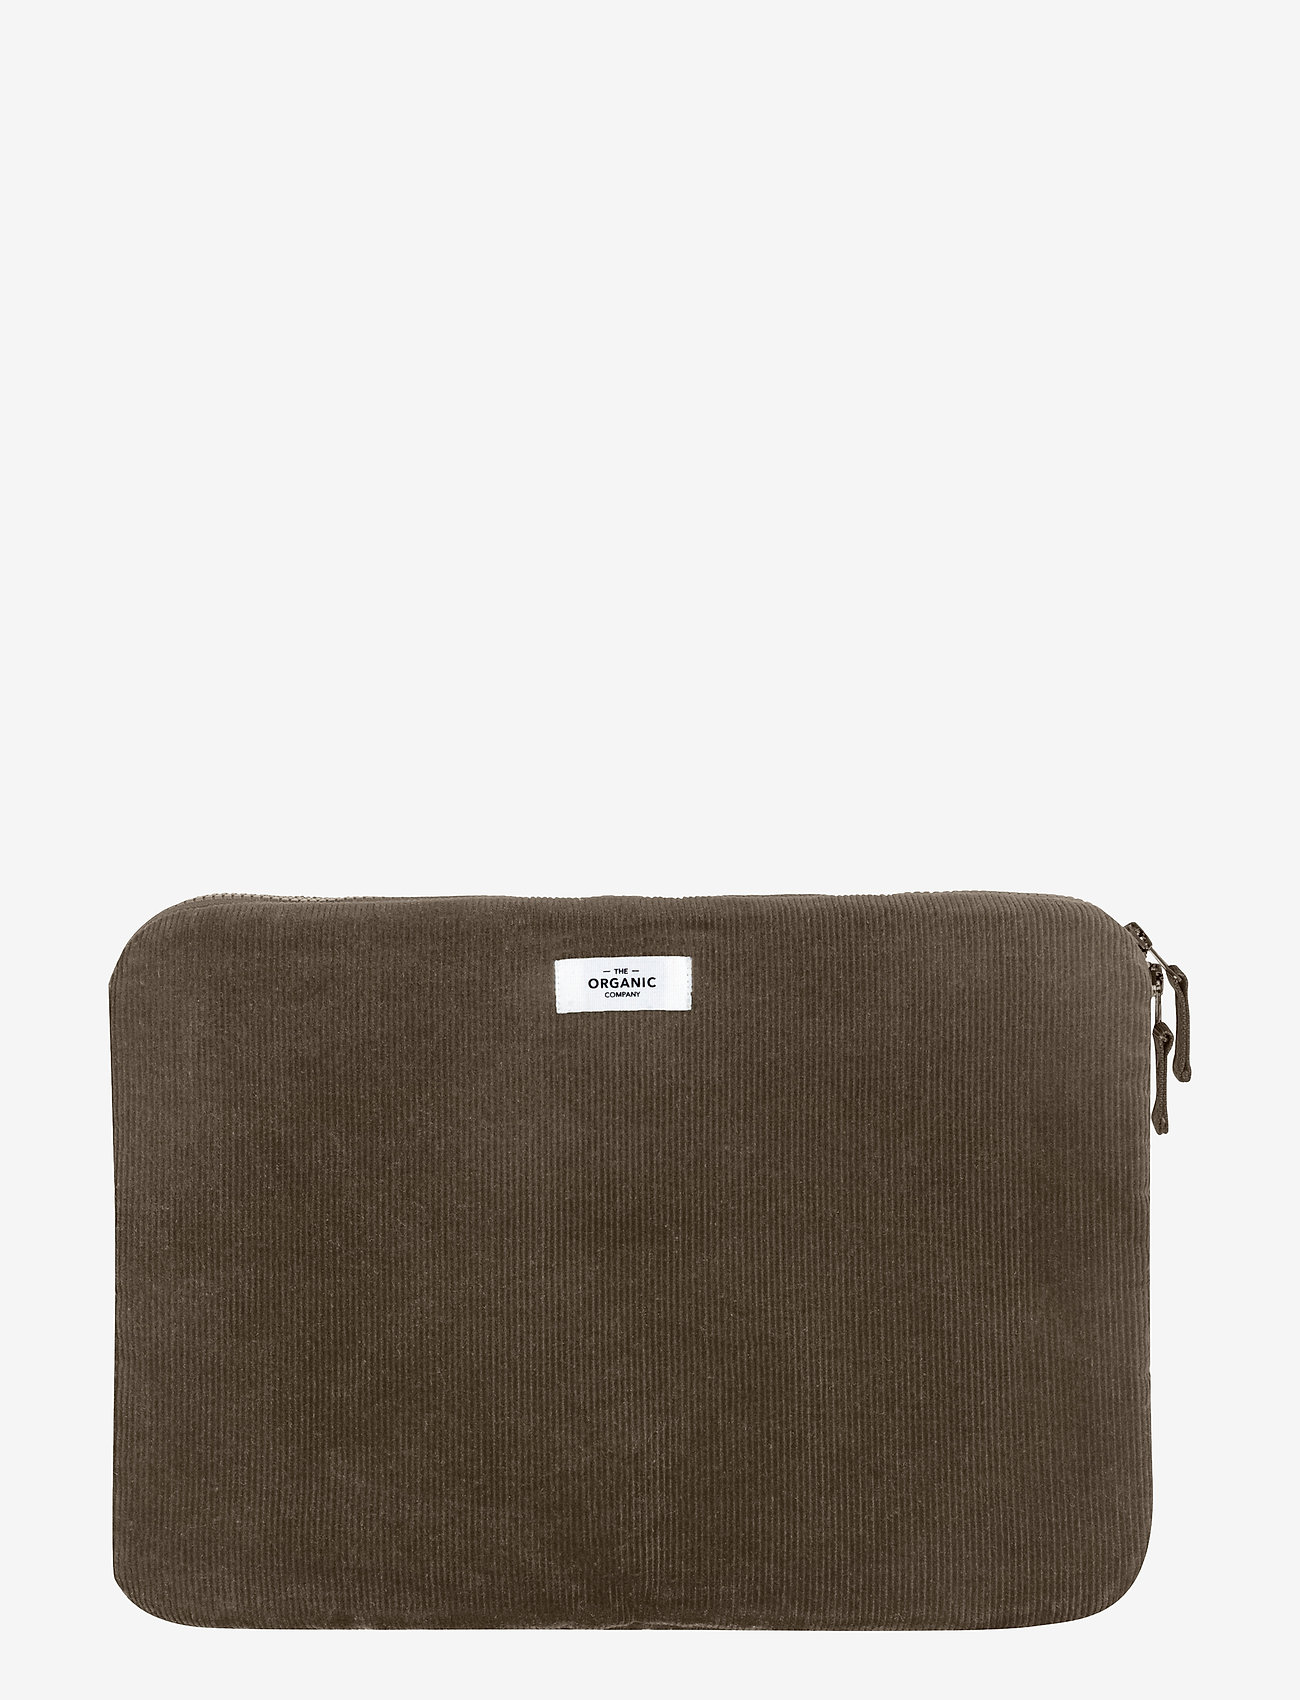 "The Organic Company - Laptop Sleeve 15"" - väskor - 225 clay - 1"